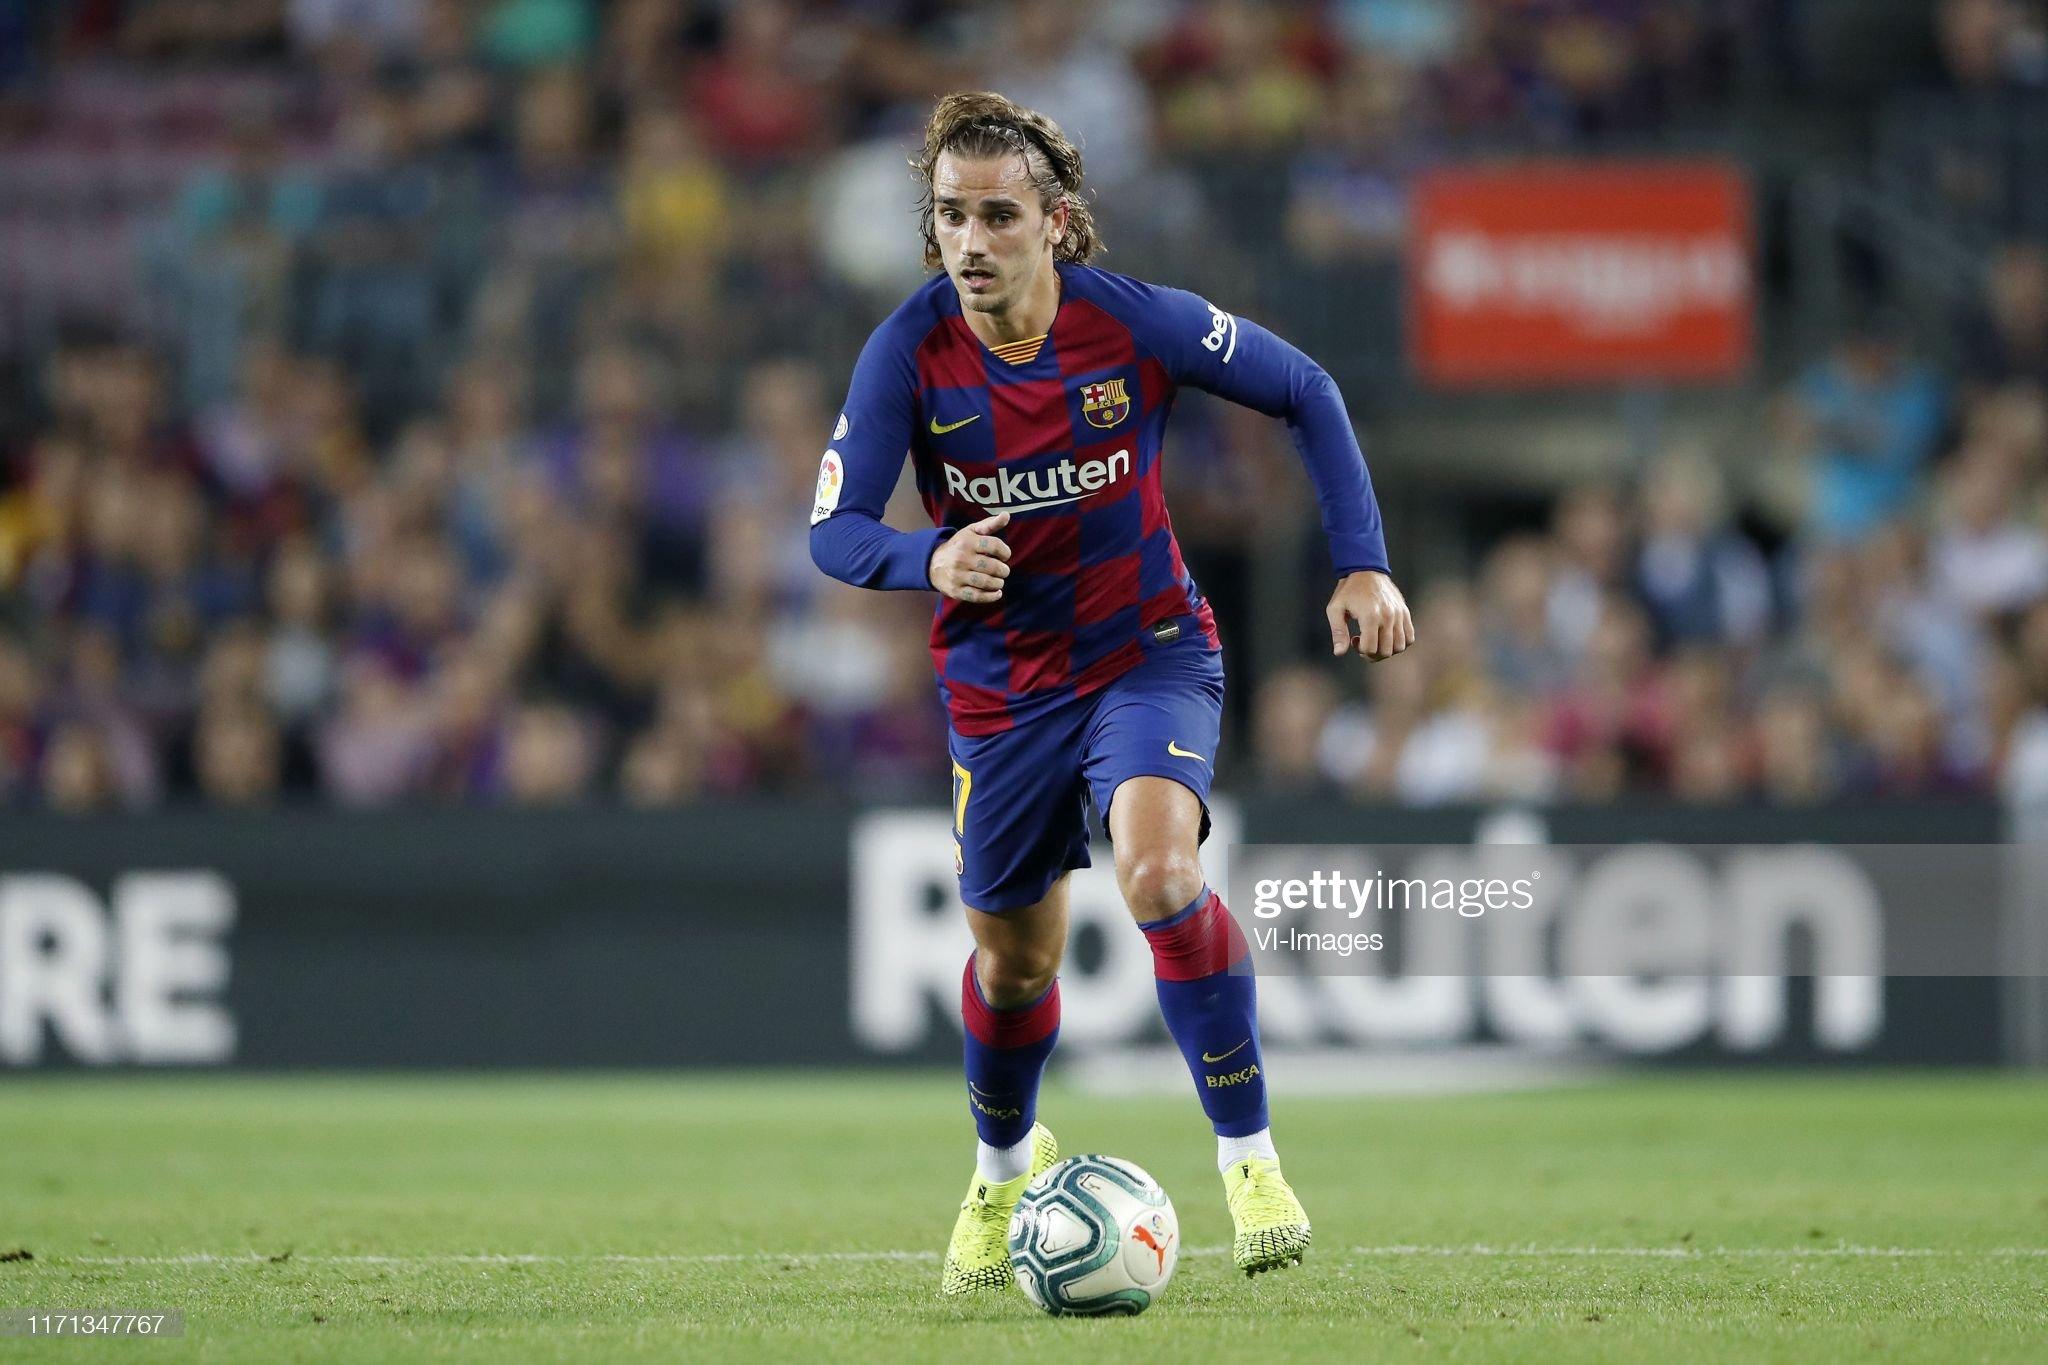 صور مباراة : برشلونة - فياريال 2-1 ( 24-09-2019 )  Antoine-griezmann-of-fc-barcelona-during-the-laliga-santander-match-picture-id1171347767?s=2048x2048